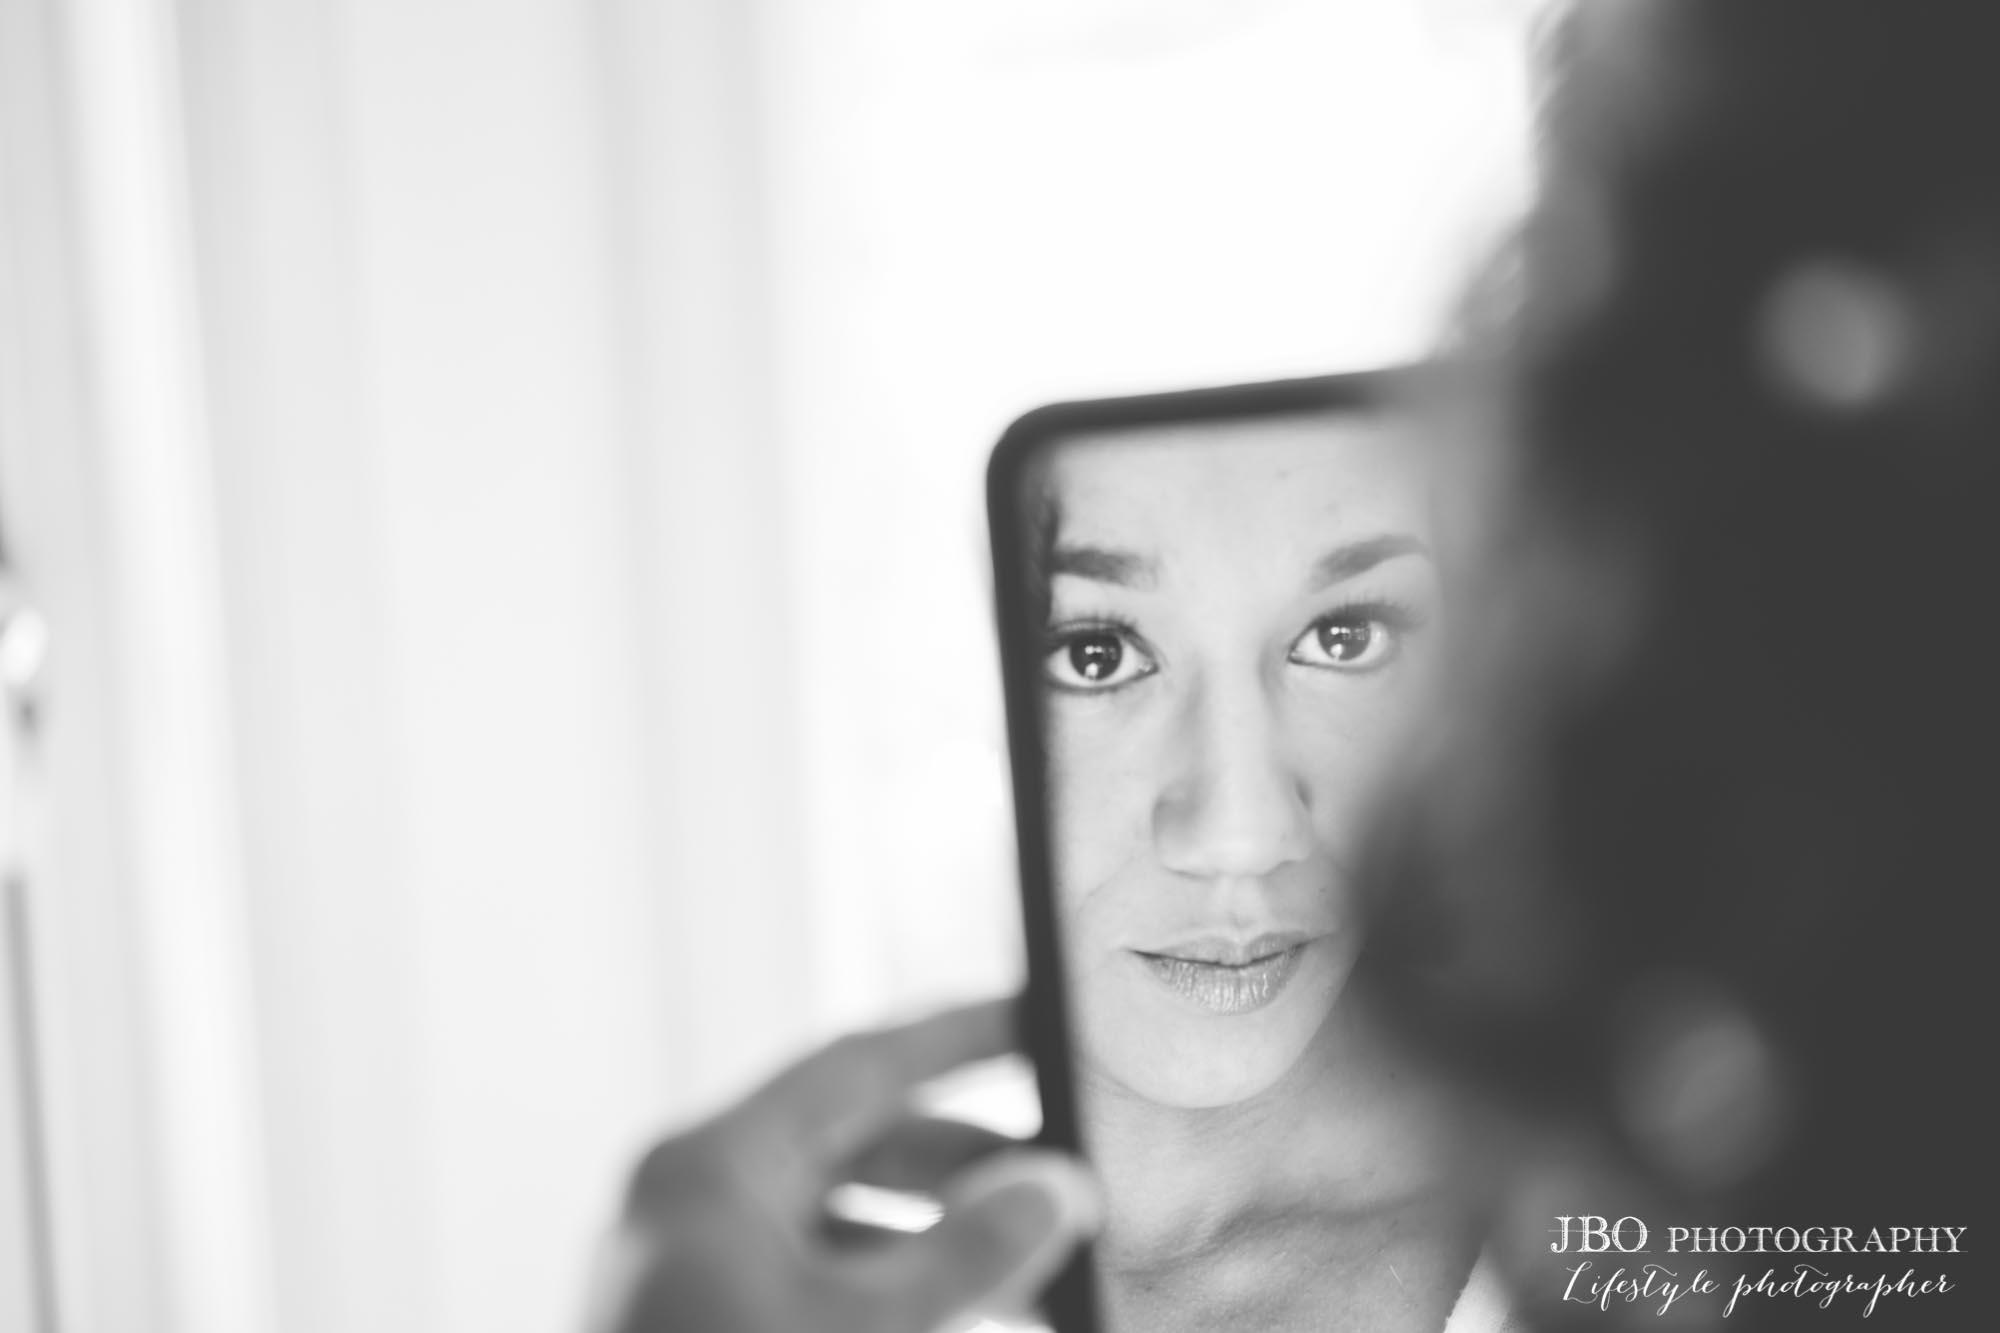 JBO Photography